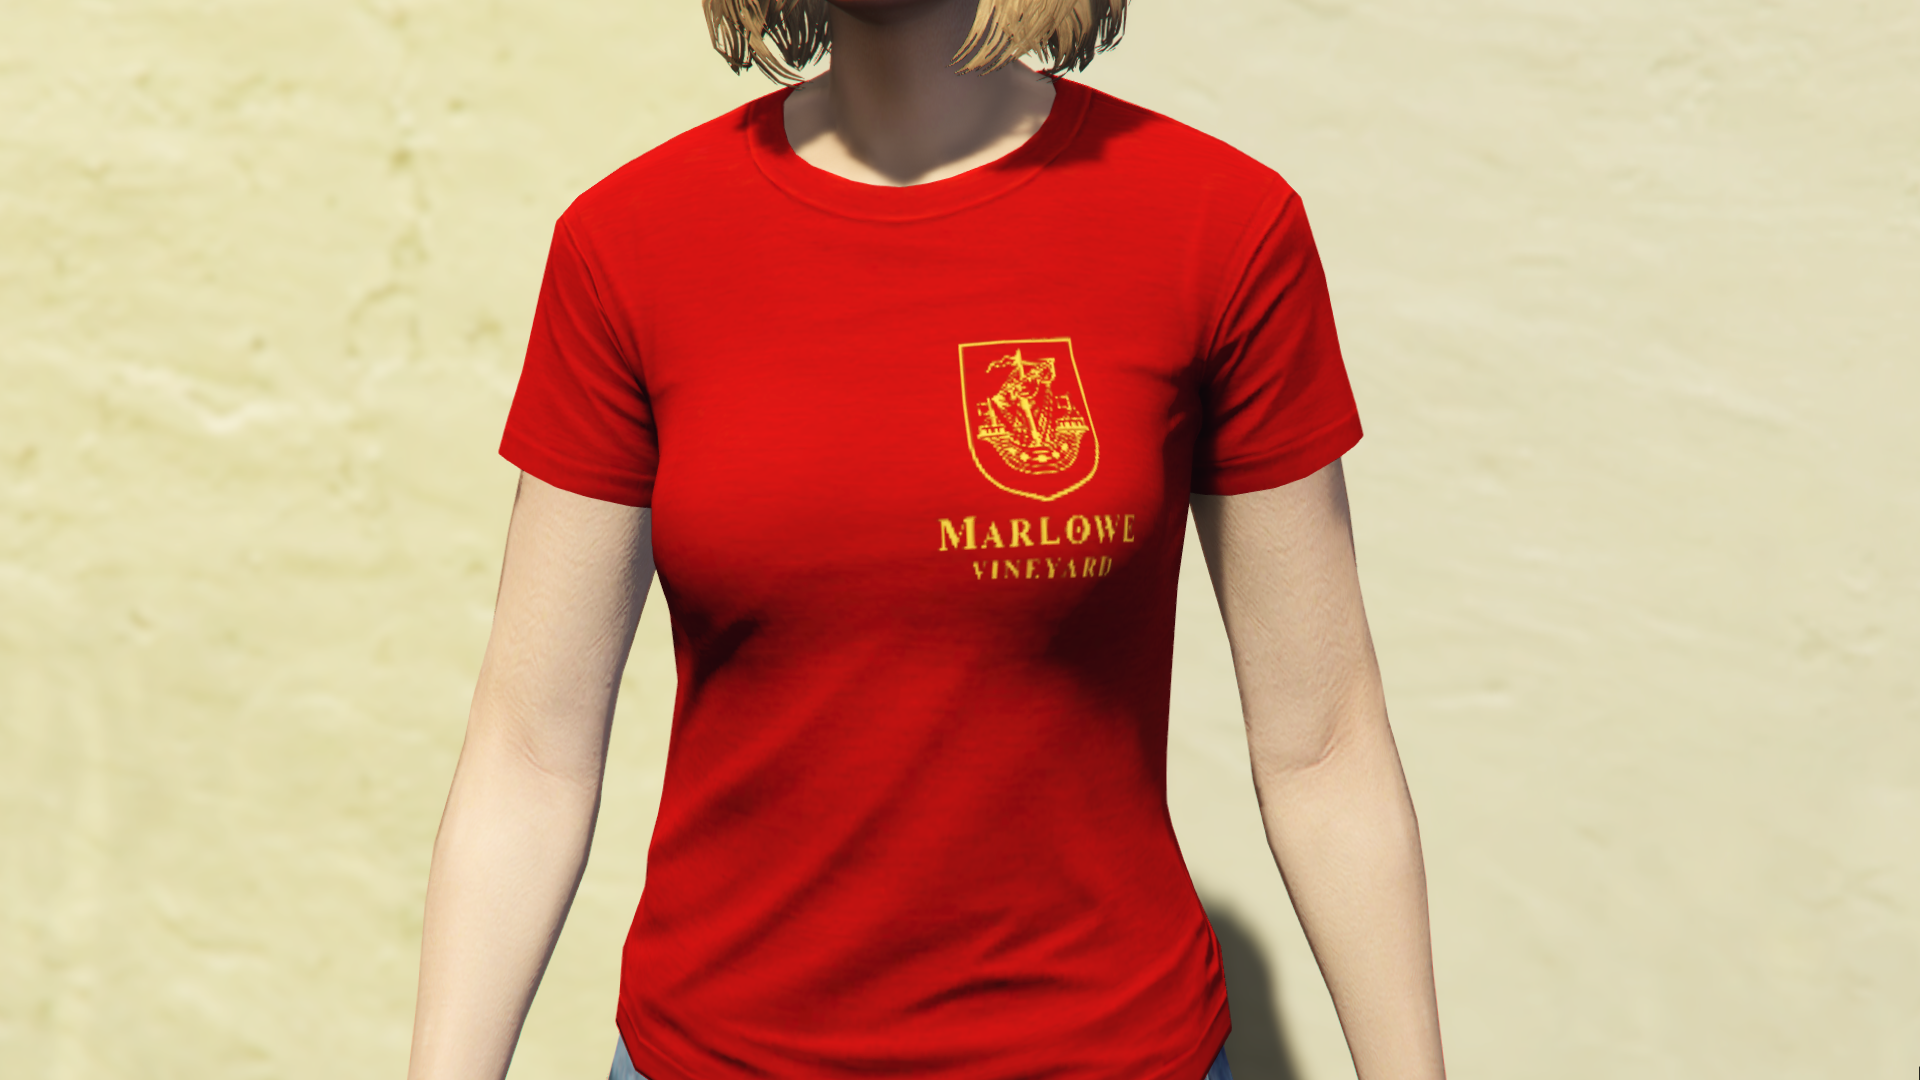 MarloweTShirt-GTAO-Female-InGame.png